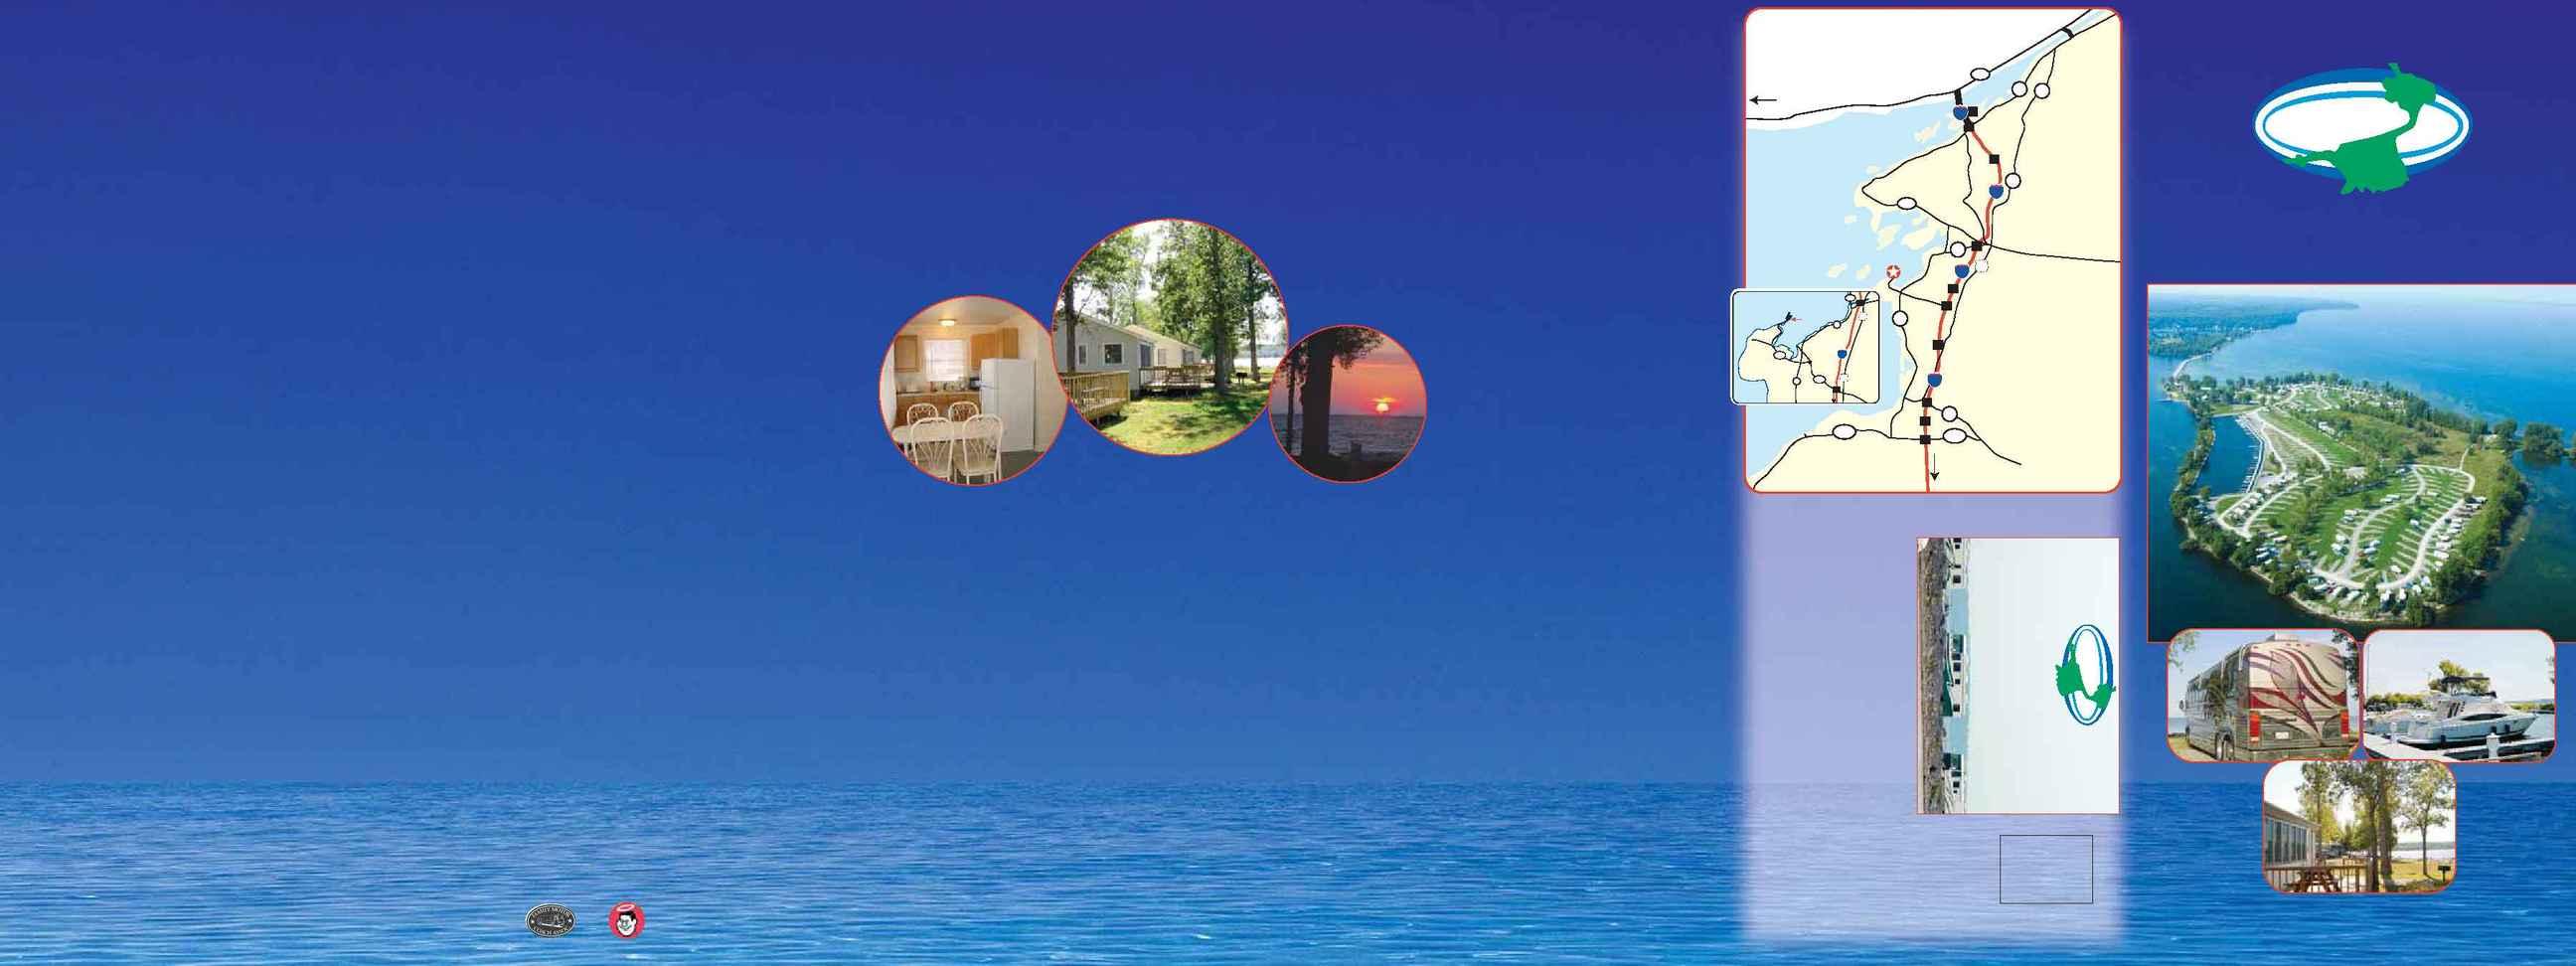 Association Island RV Resort and Marina - AIResort Colour Brochure 2005